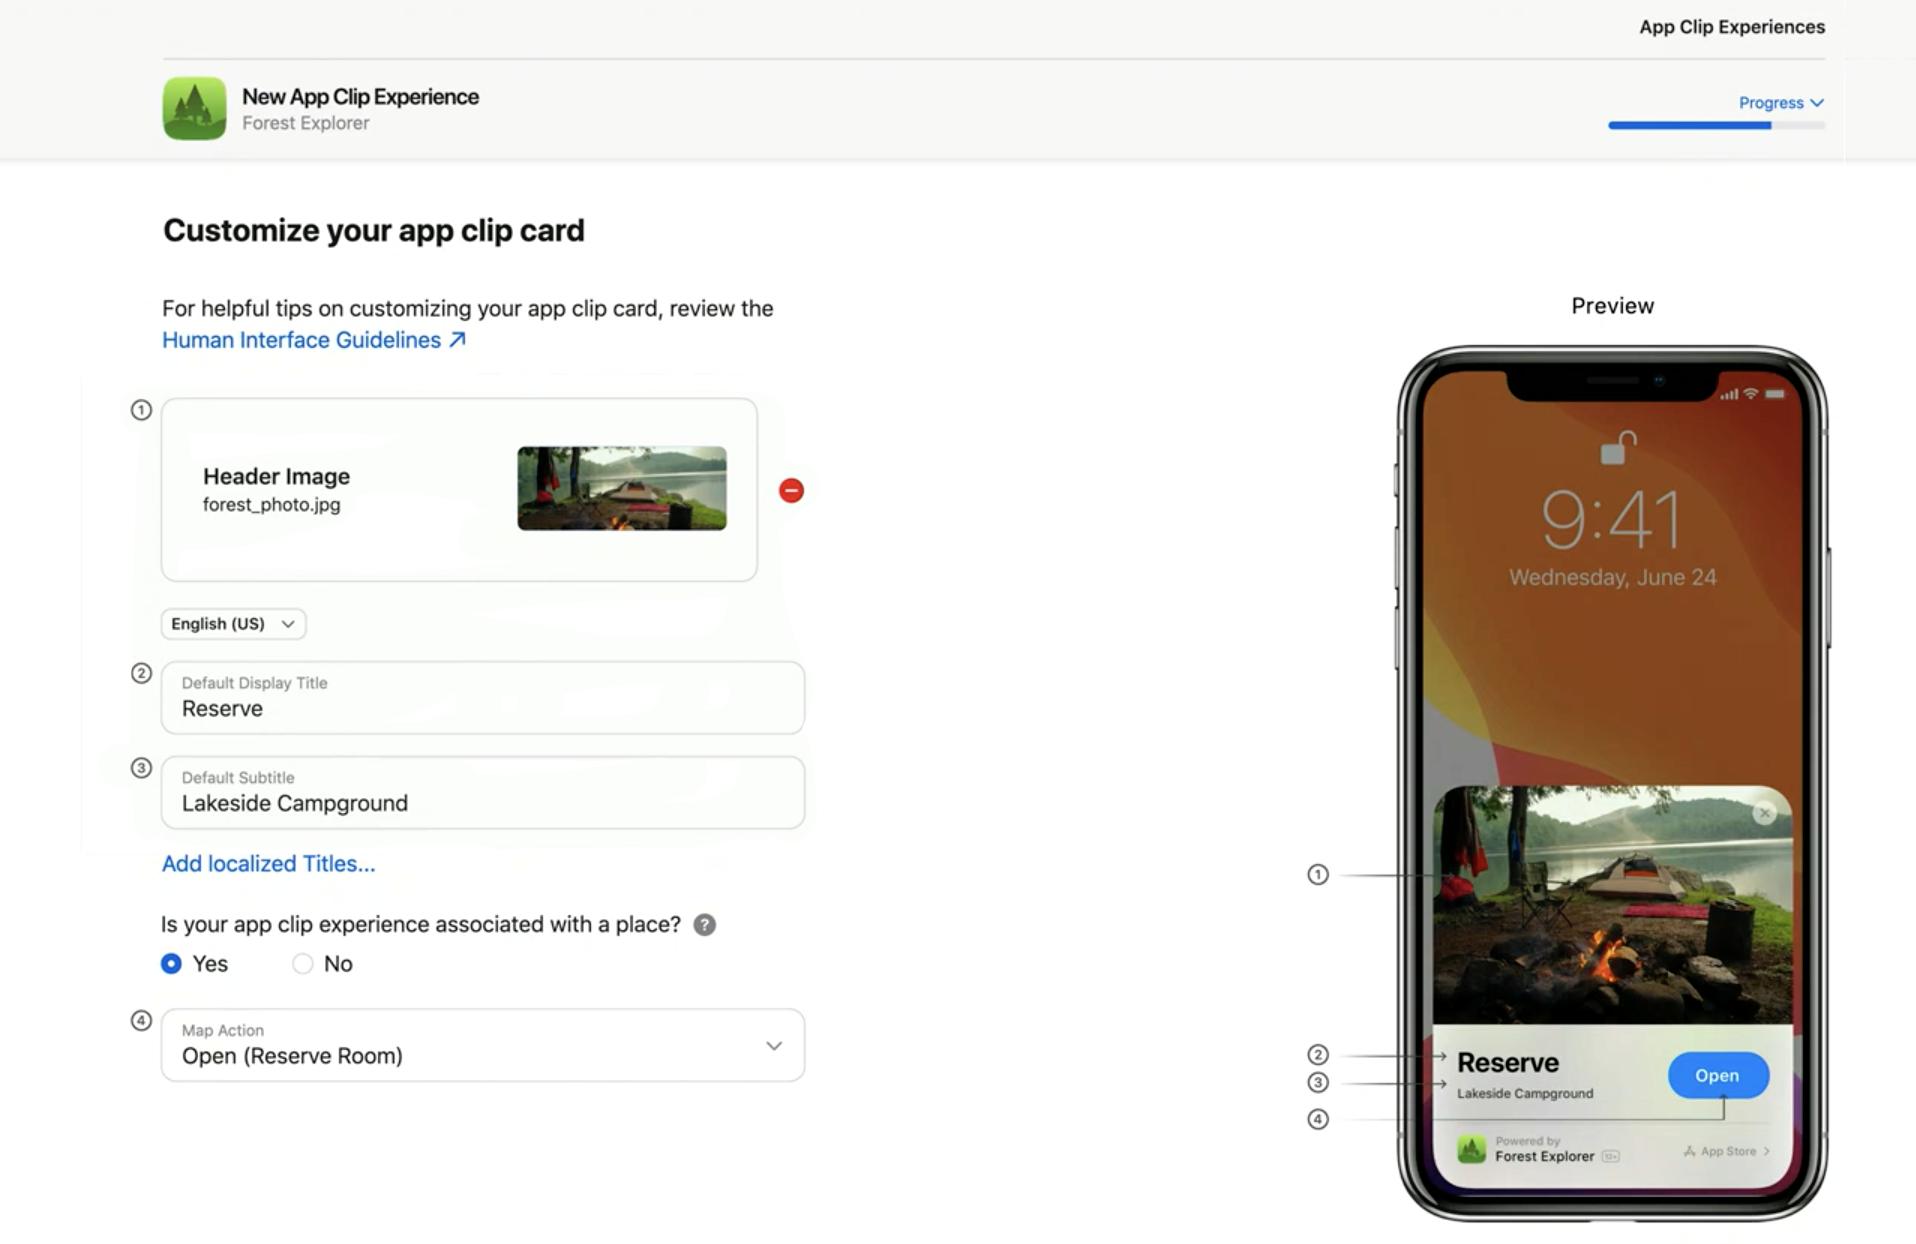 App Clip Experience Customization